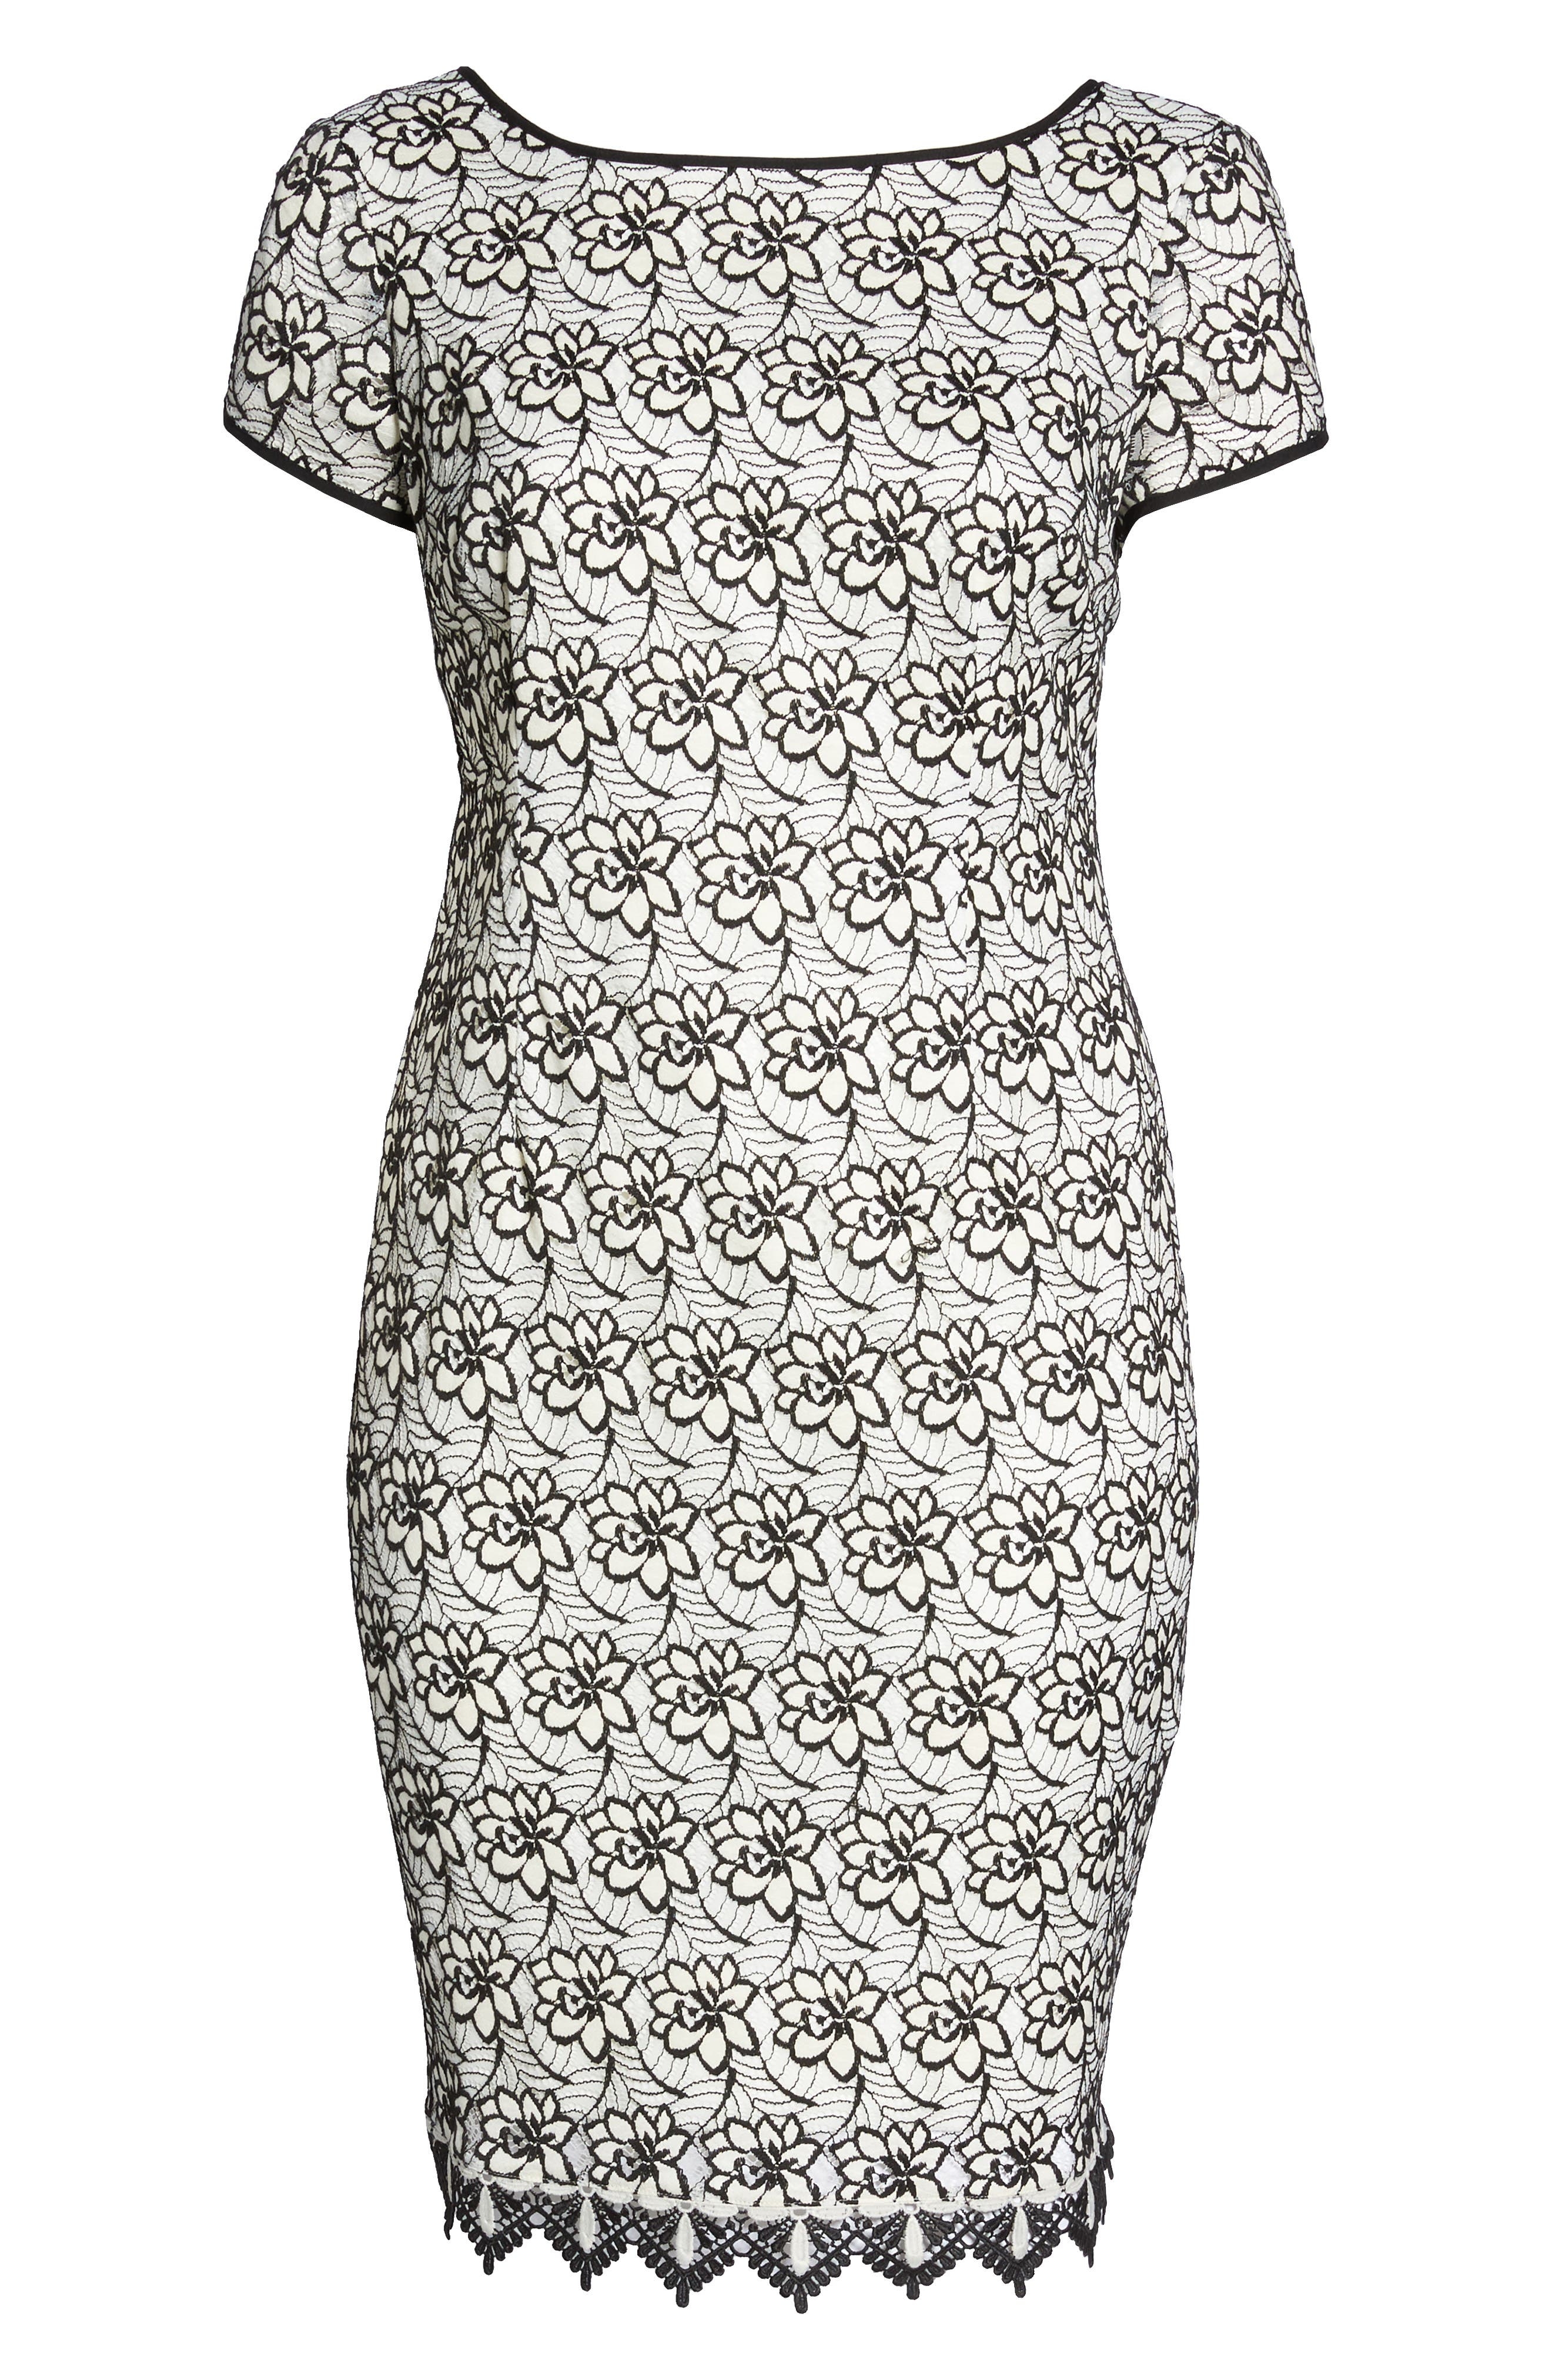 Lace Trim Sheath Dress,                             Alternate thumbnail 6, color,